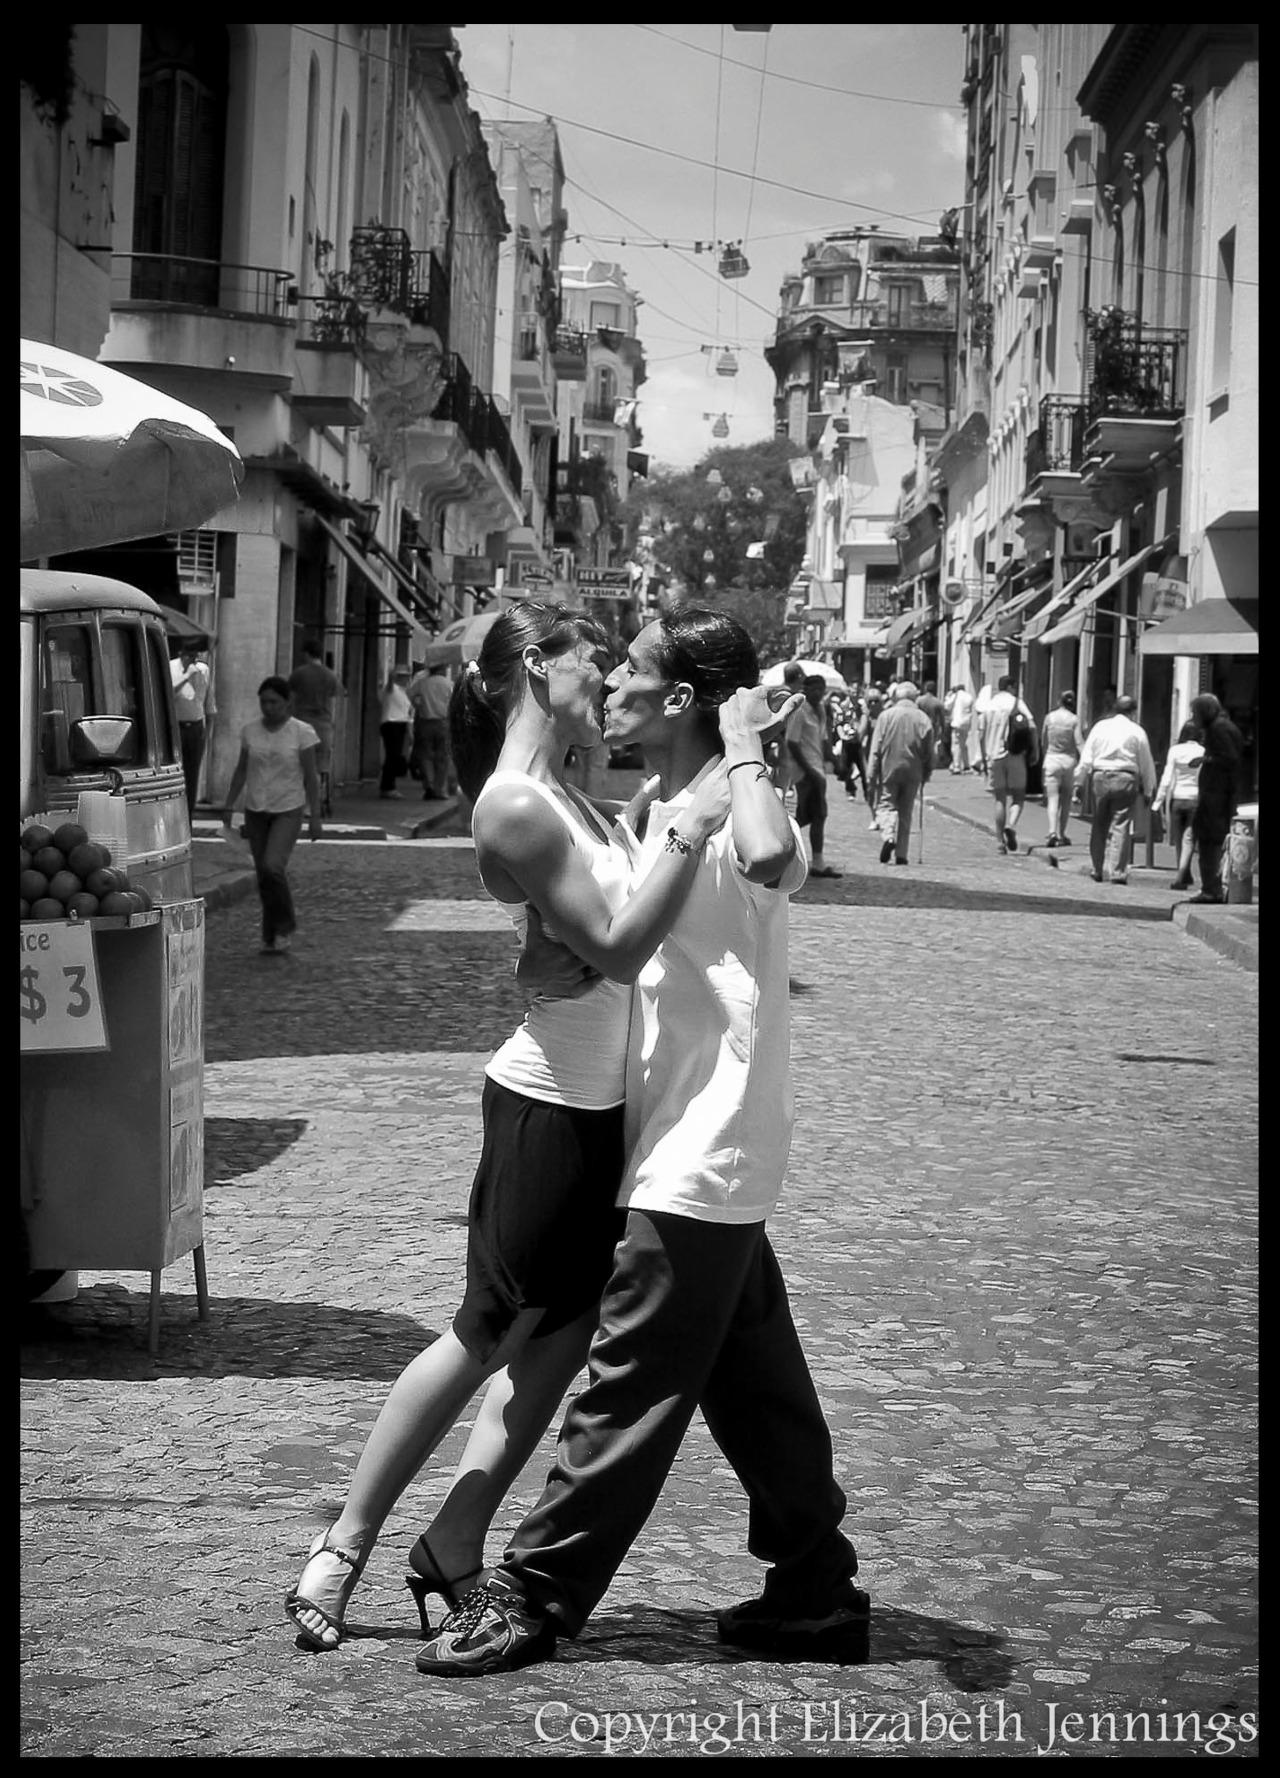 tango dancers Elizabeth Jennings